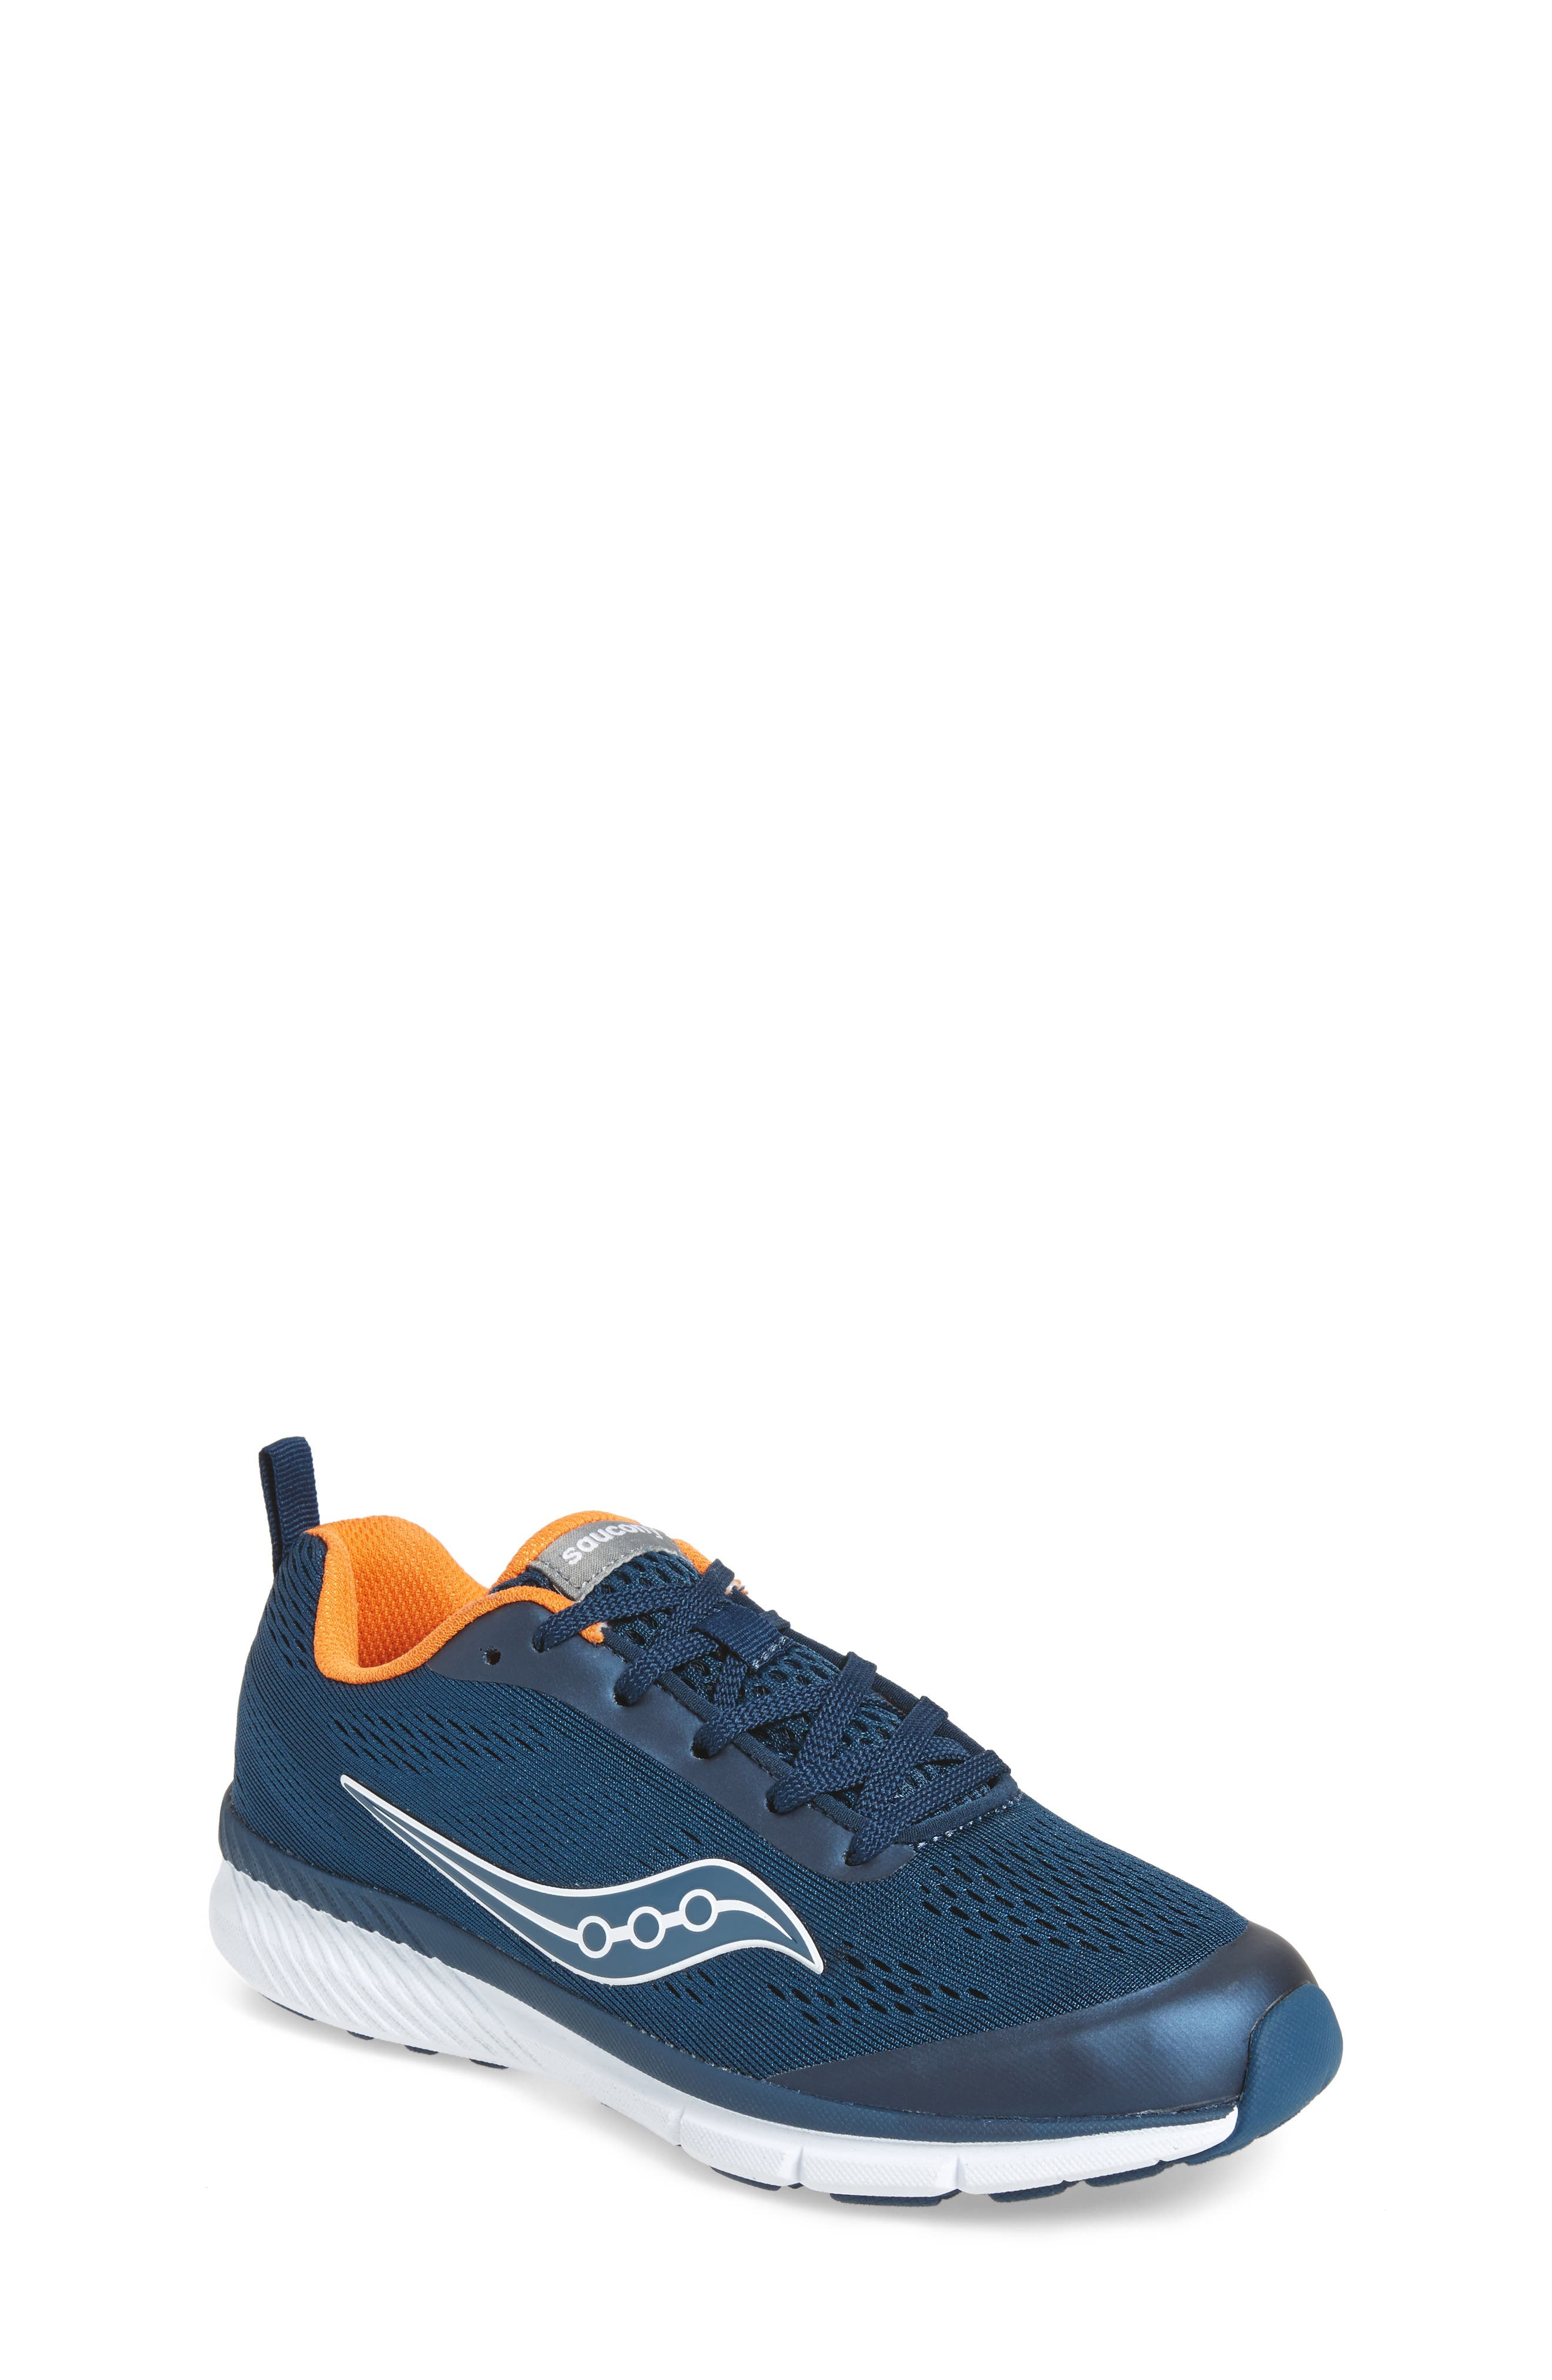 Ideal Sneaker,                         Main,                         color, 410